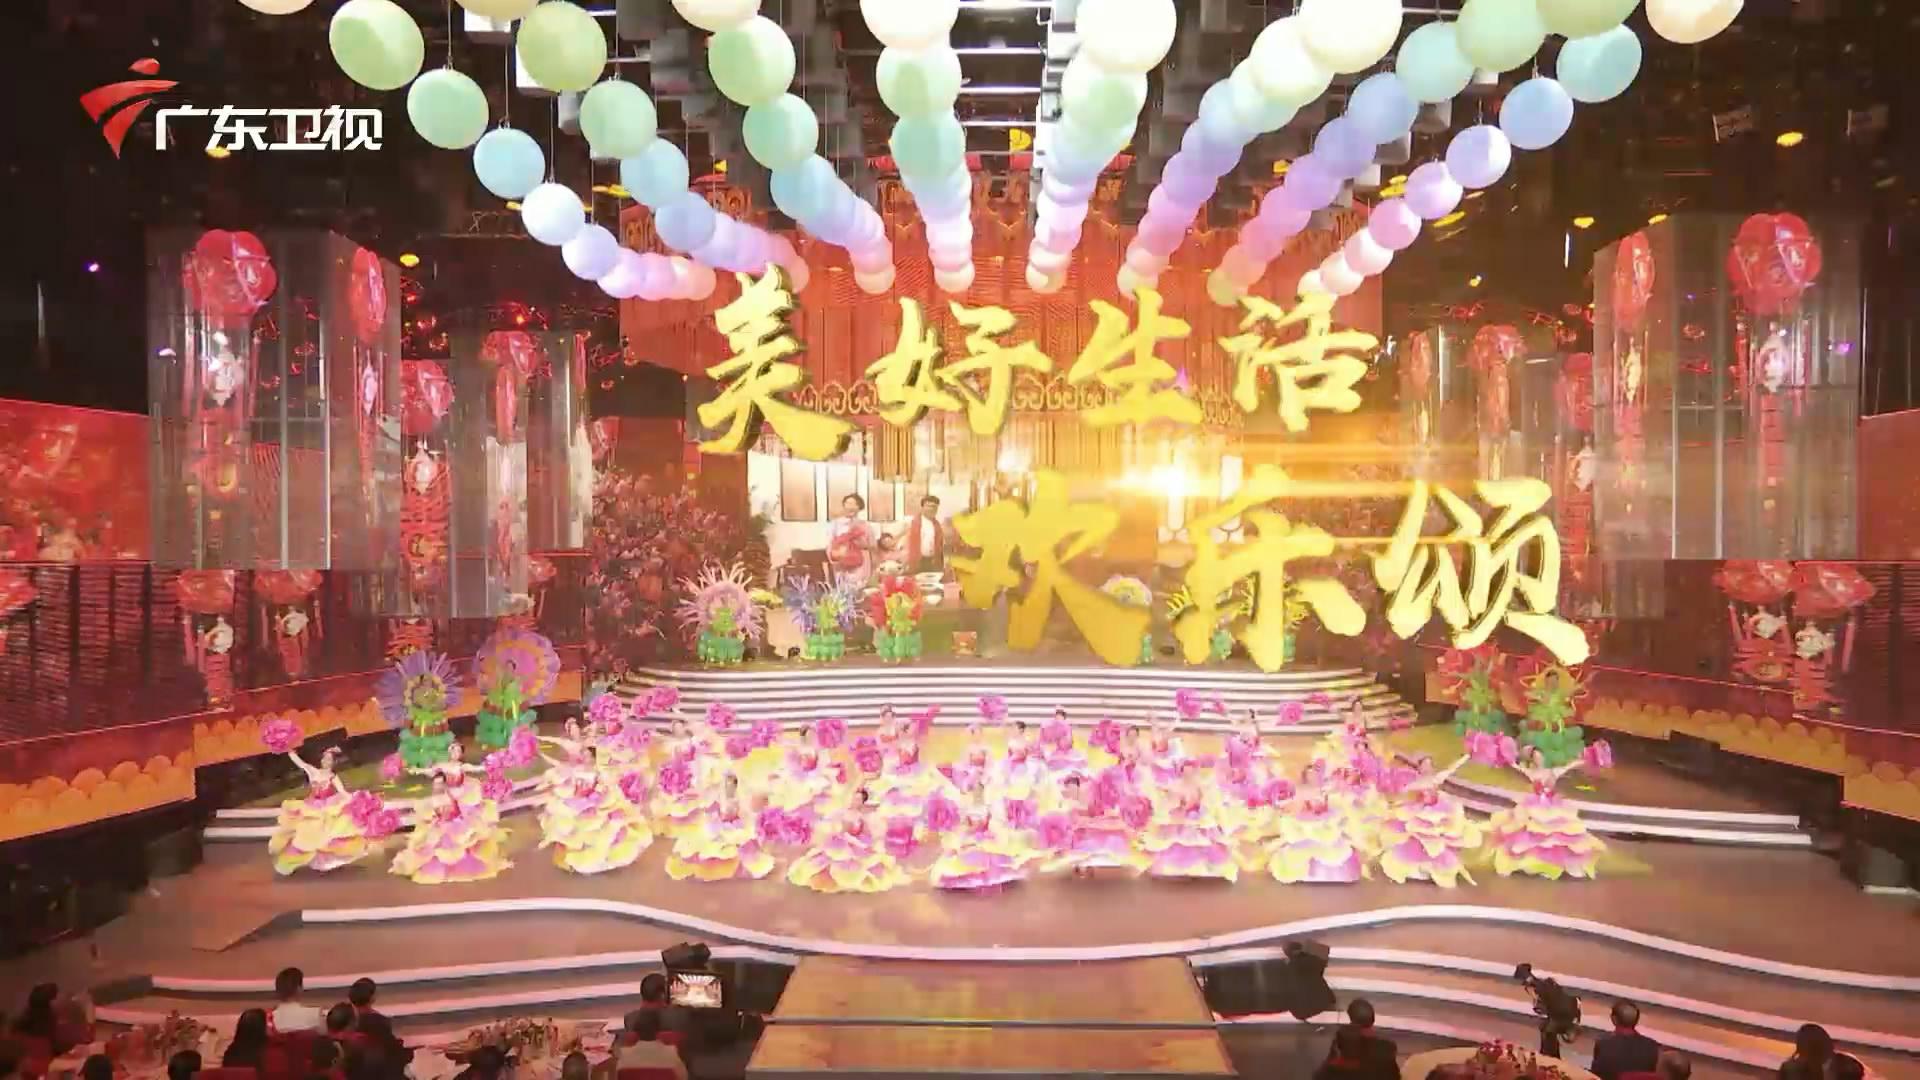 manbetx手机版 - 登陆卫视春晚节目单出炉!你最期待哪个节目?